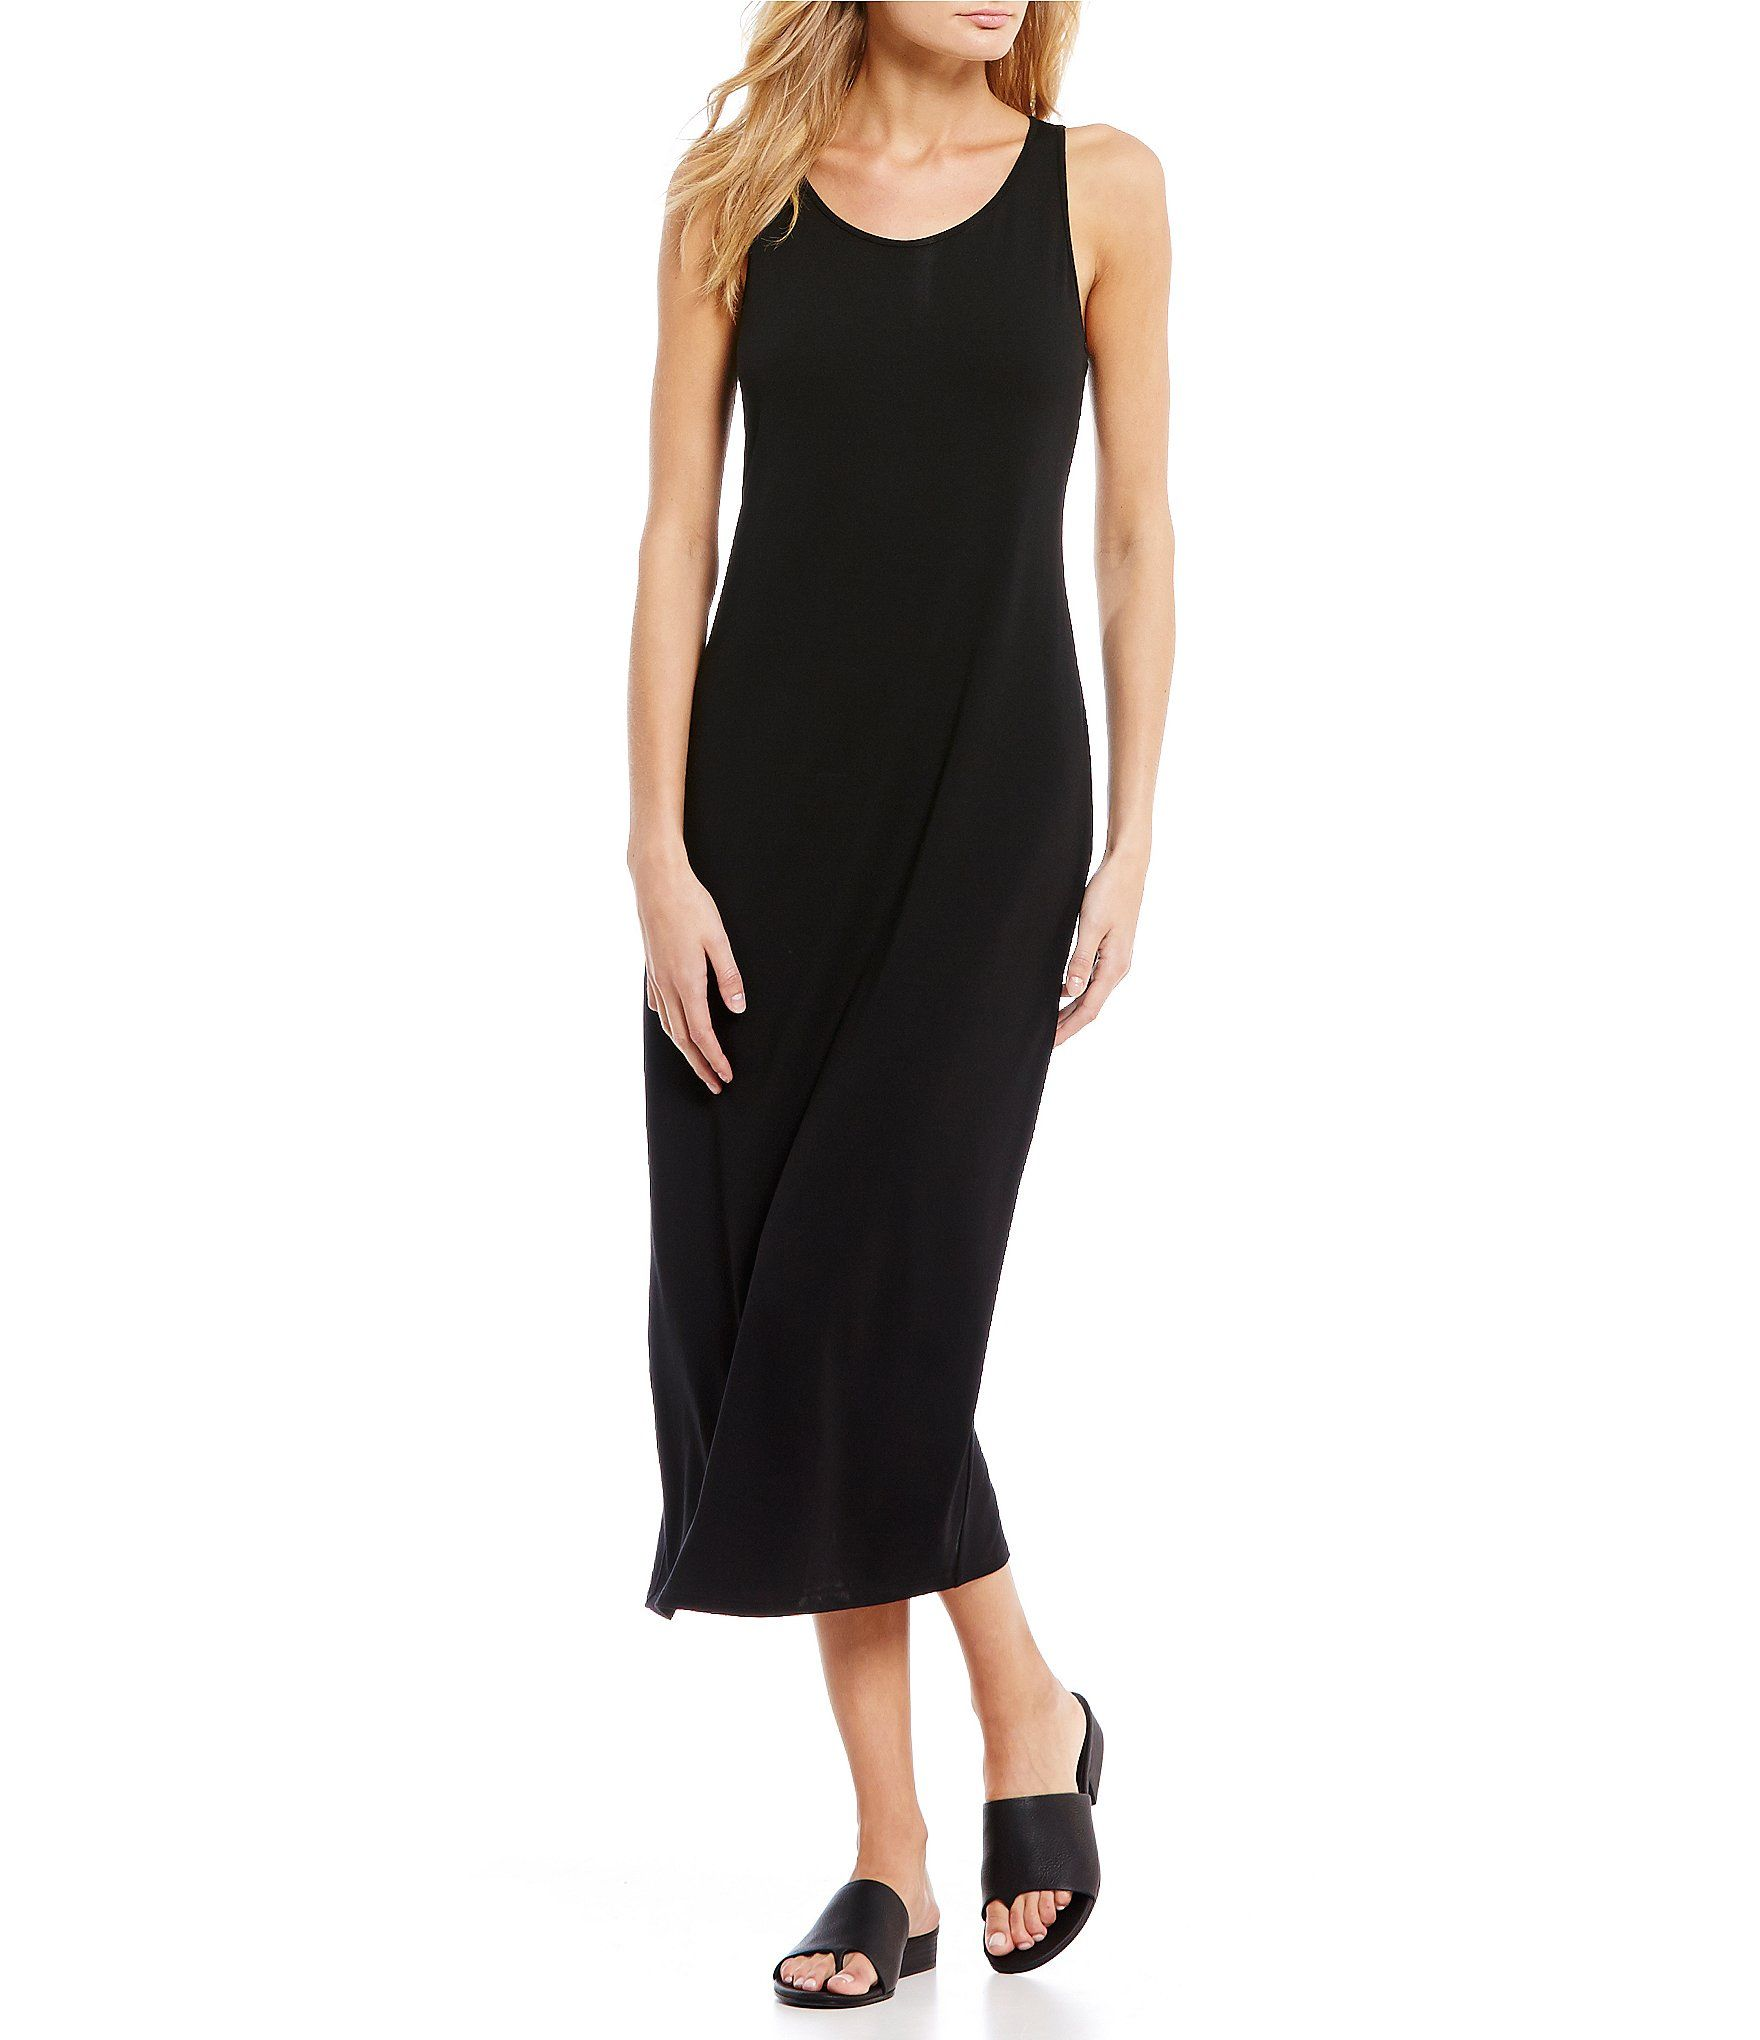 b1c933c77db Shop for Eileen Fisher Scoop Neck Tank Dress at Dillards.com. Visit Dillards.com  to find clothing